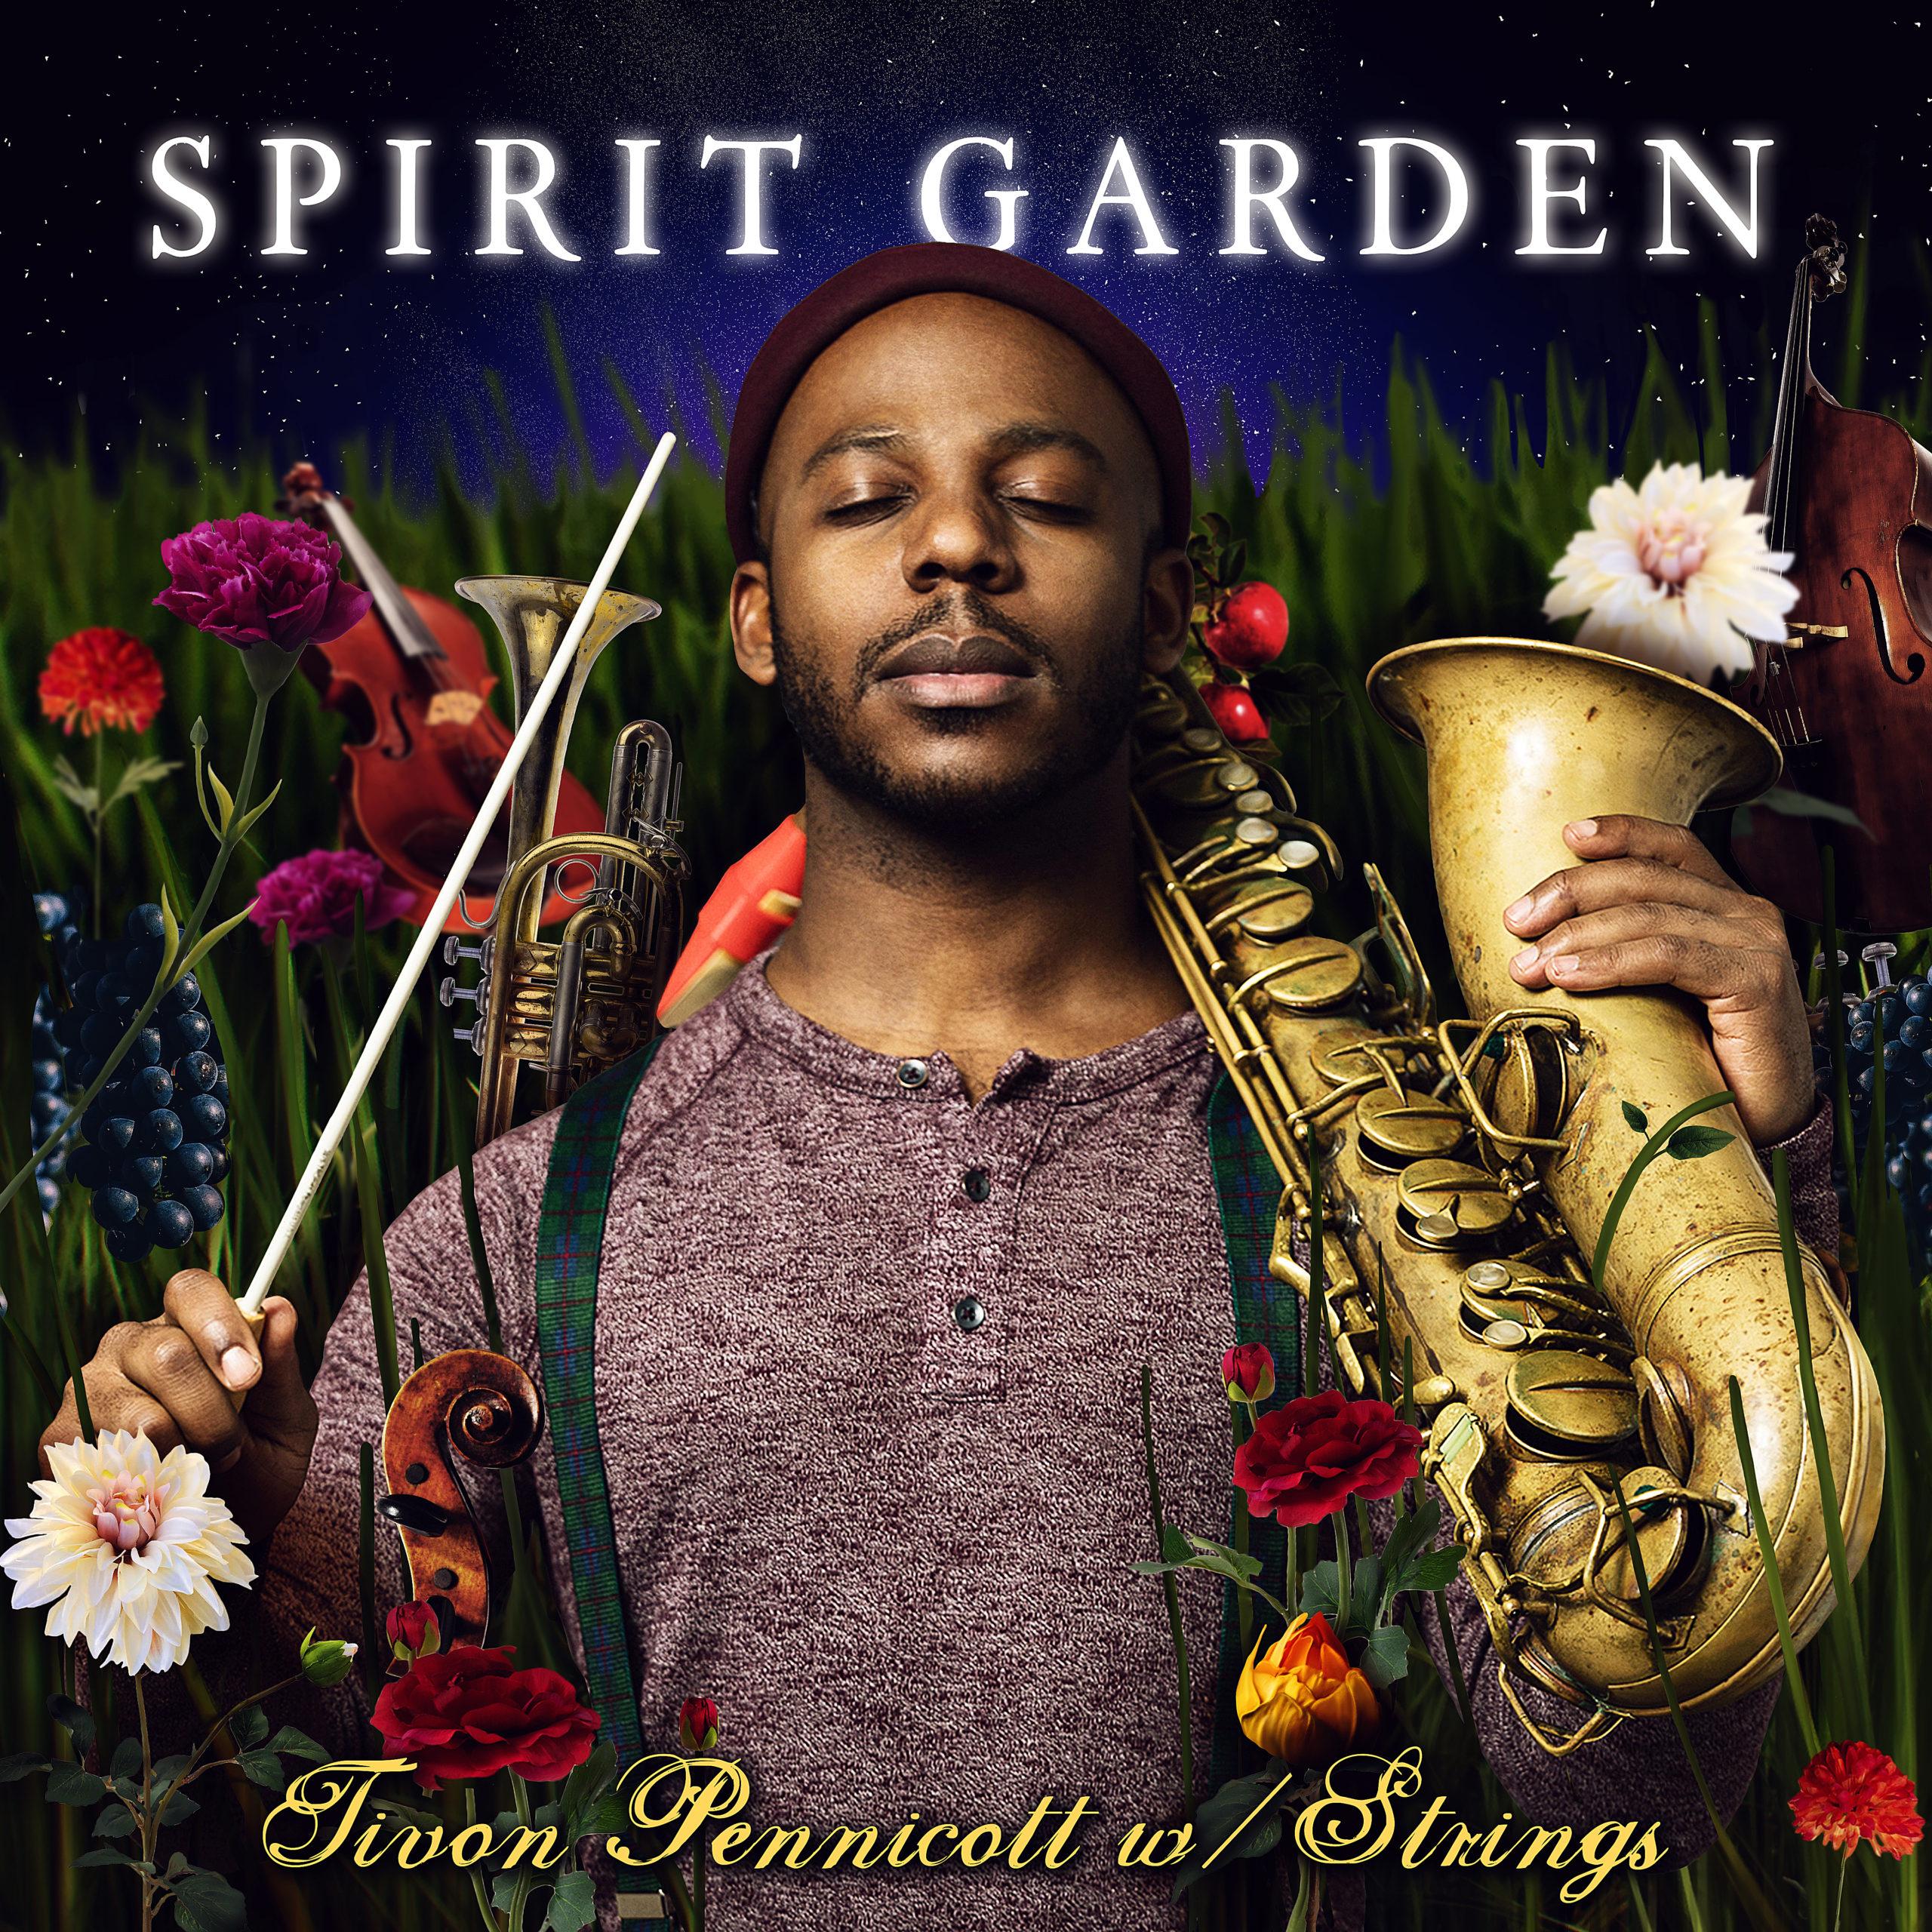 Spirit Garden CD/Vinyl